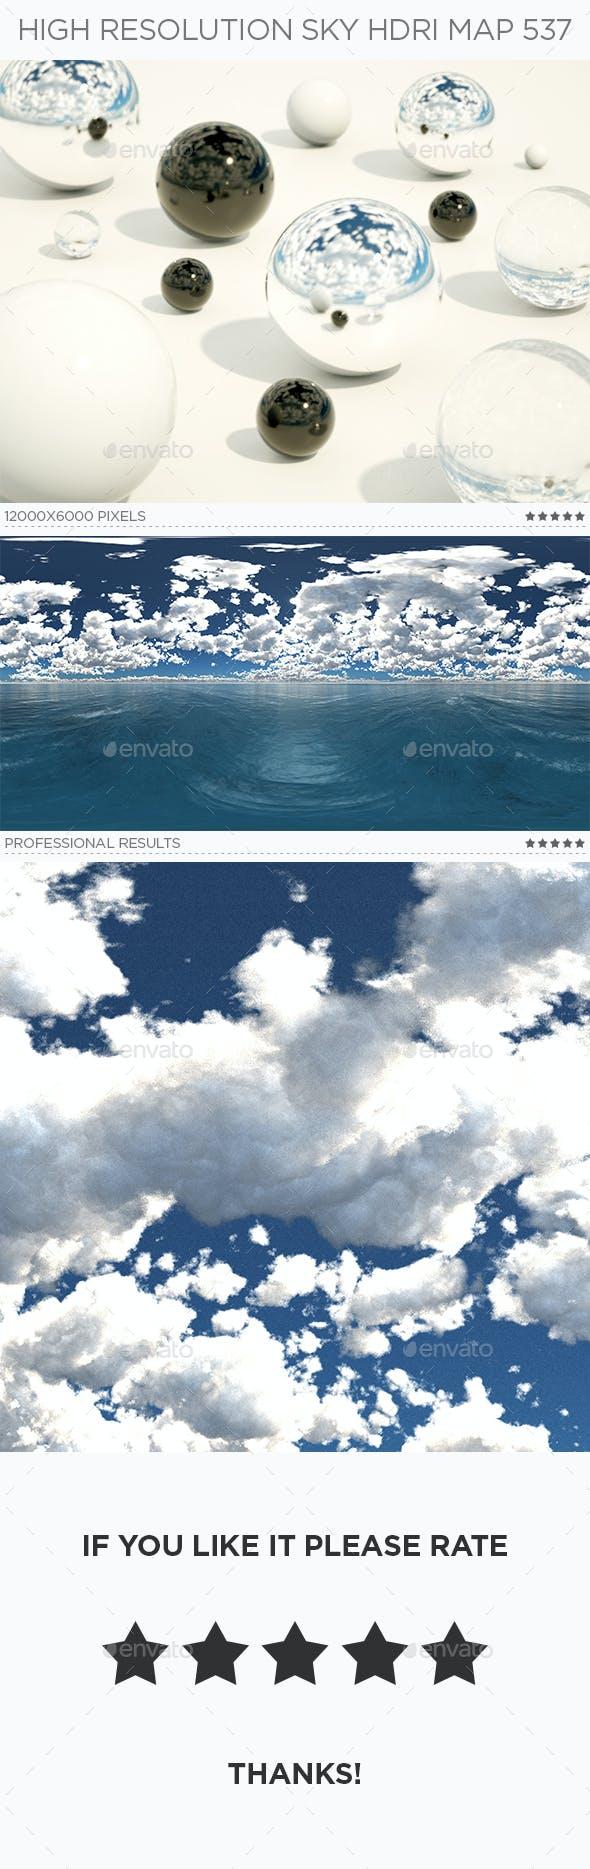 High Resolution Sky HDRi Map 537 - 3DOcean Item for Sale